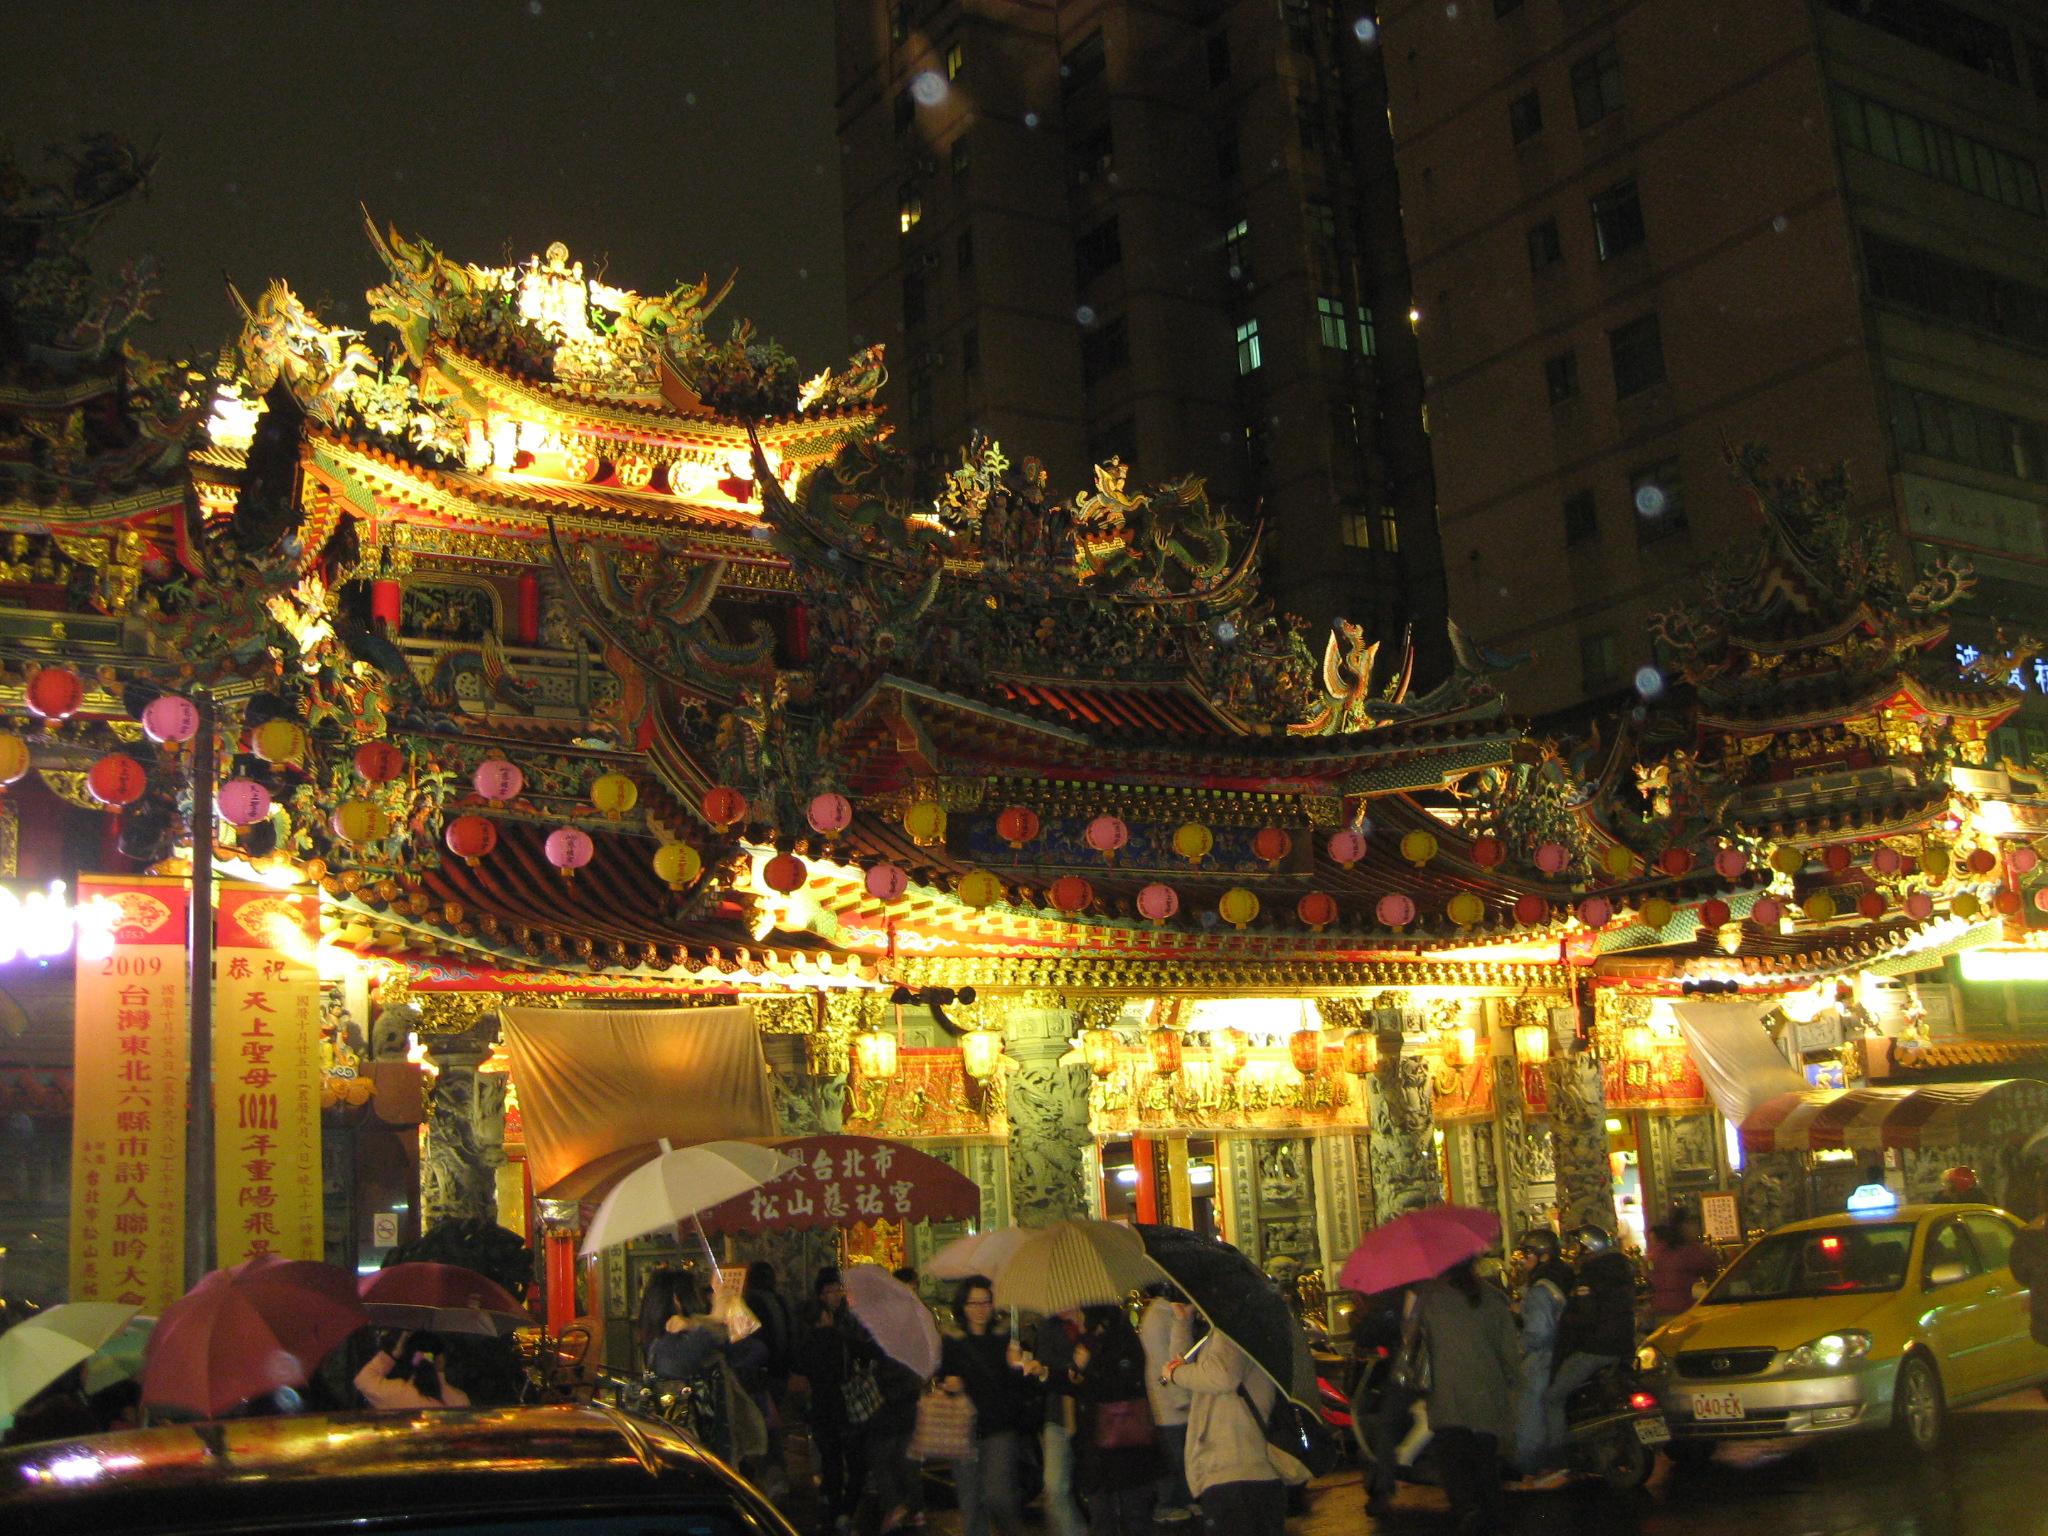 Taiwan Day 3 Xin Zhu Leofoo Theme Park 新竹六福村 Wu Fen Pu